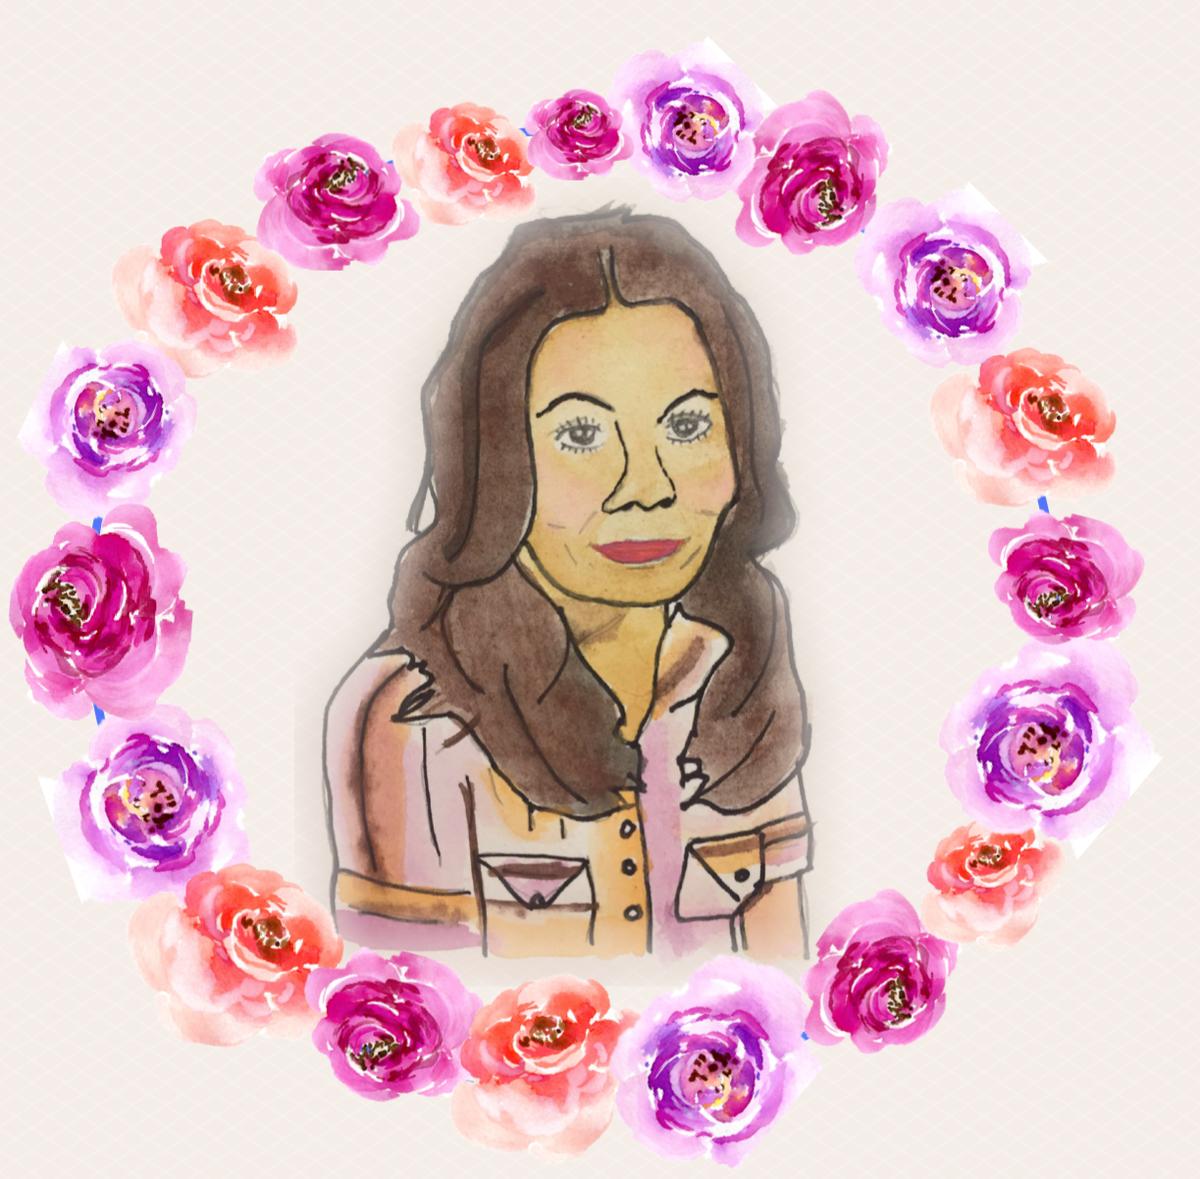 Artwork of Rosie Jiménez by Erika Galindo, Lilith Fund